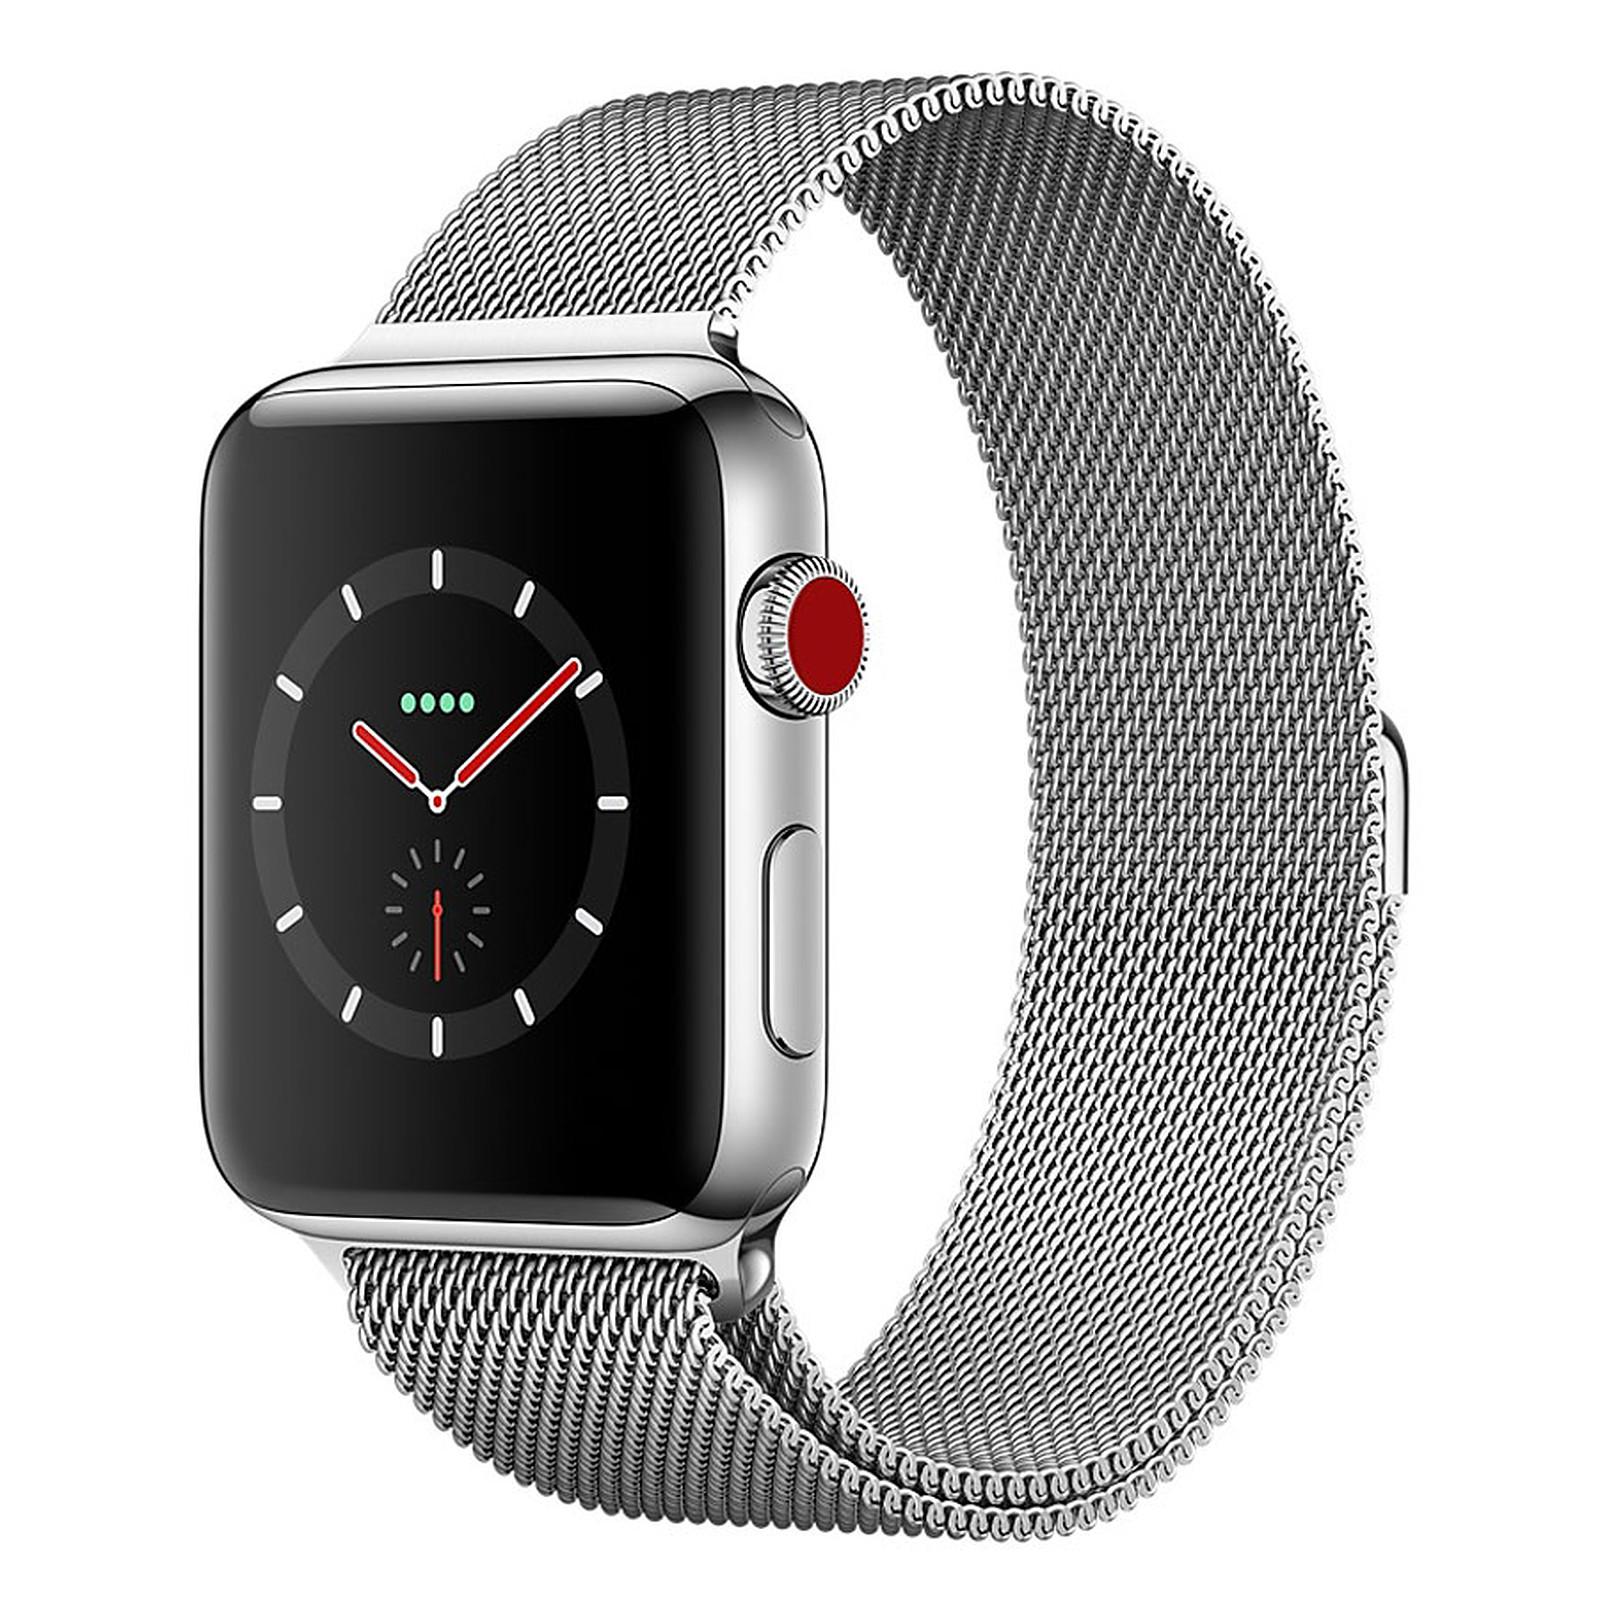 Apple Watch Series 3 GPS + Cellular Acier Milanais 38 mm